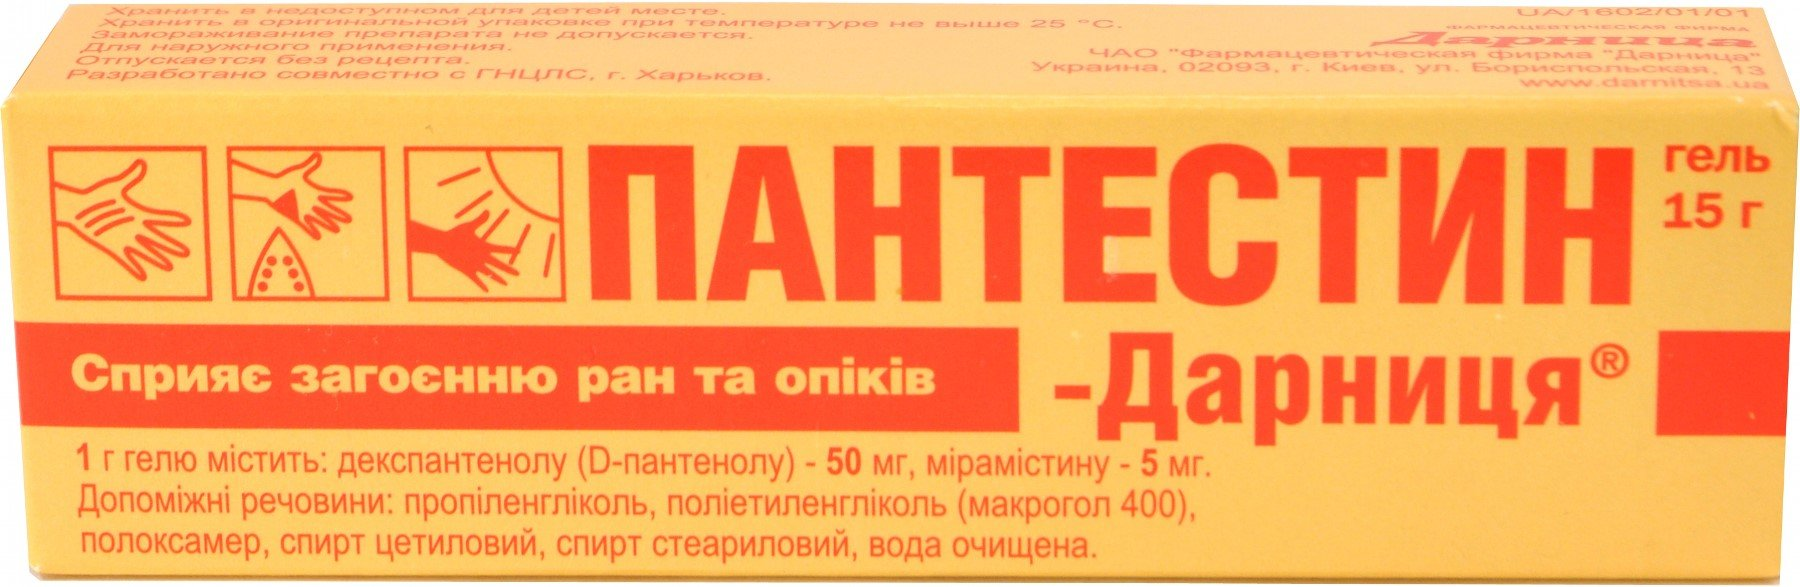 Pantestin (dexpanthenol, myramistin) gel 15 g.